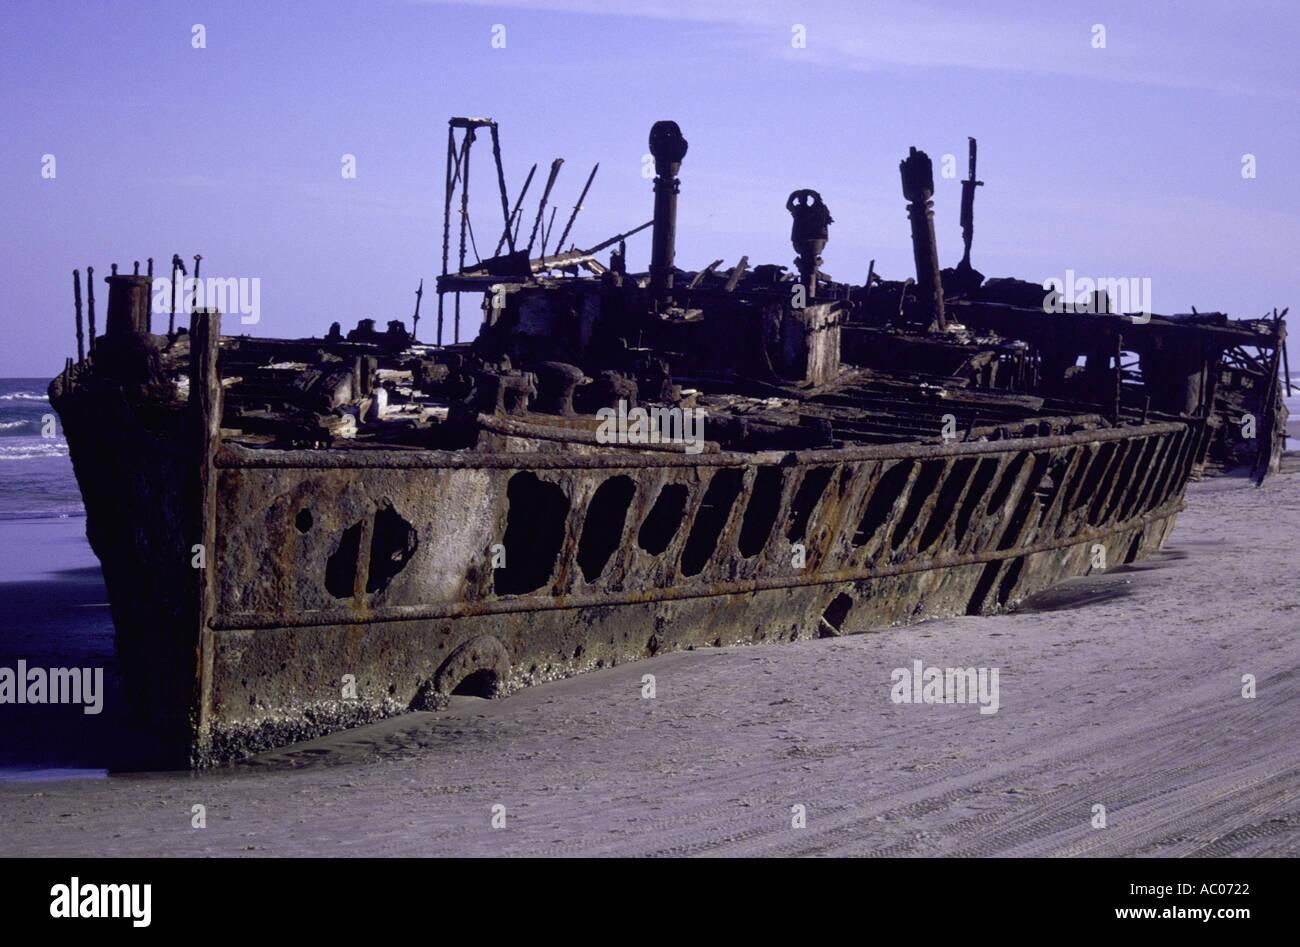 Shipwreck the Maheno - Stock Image